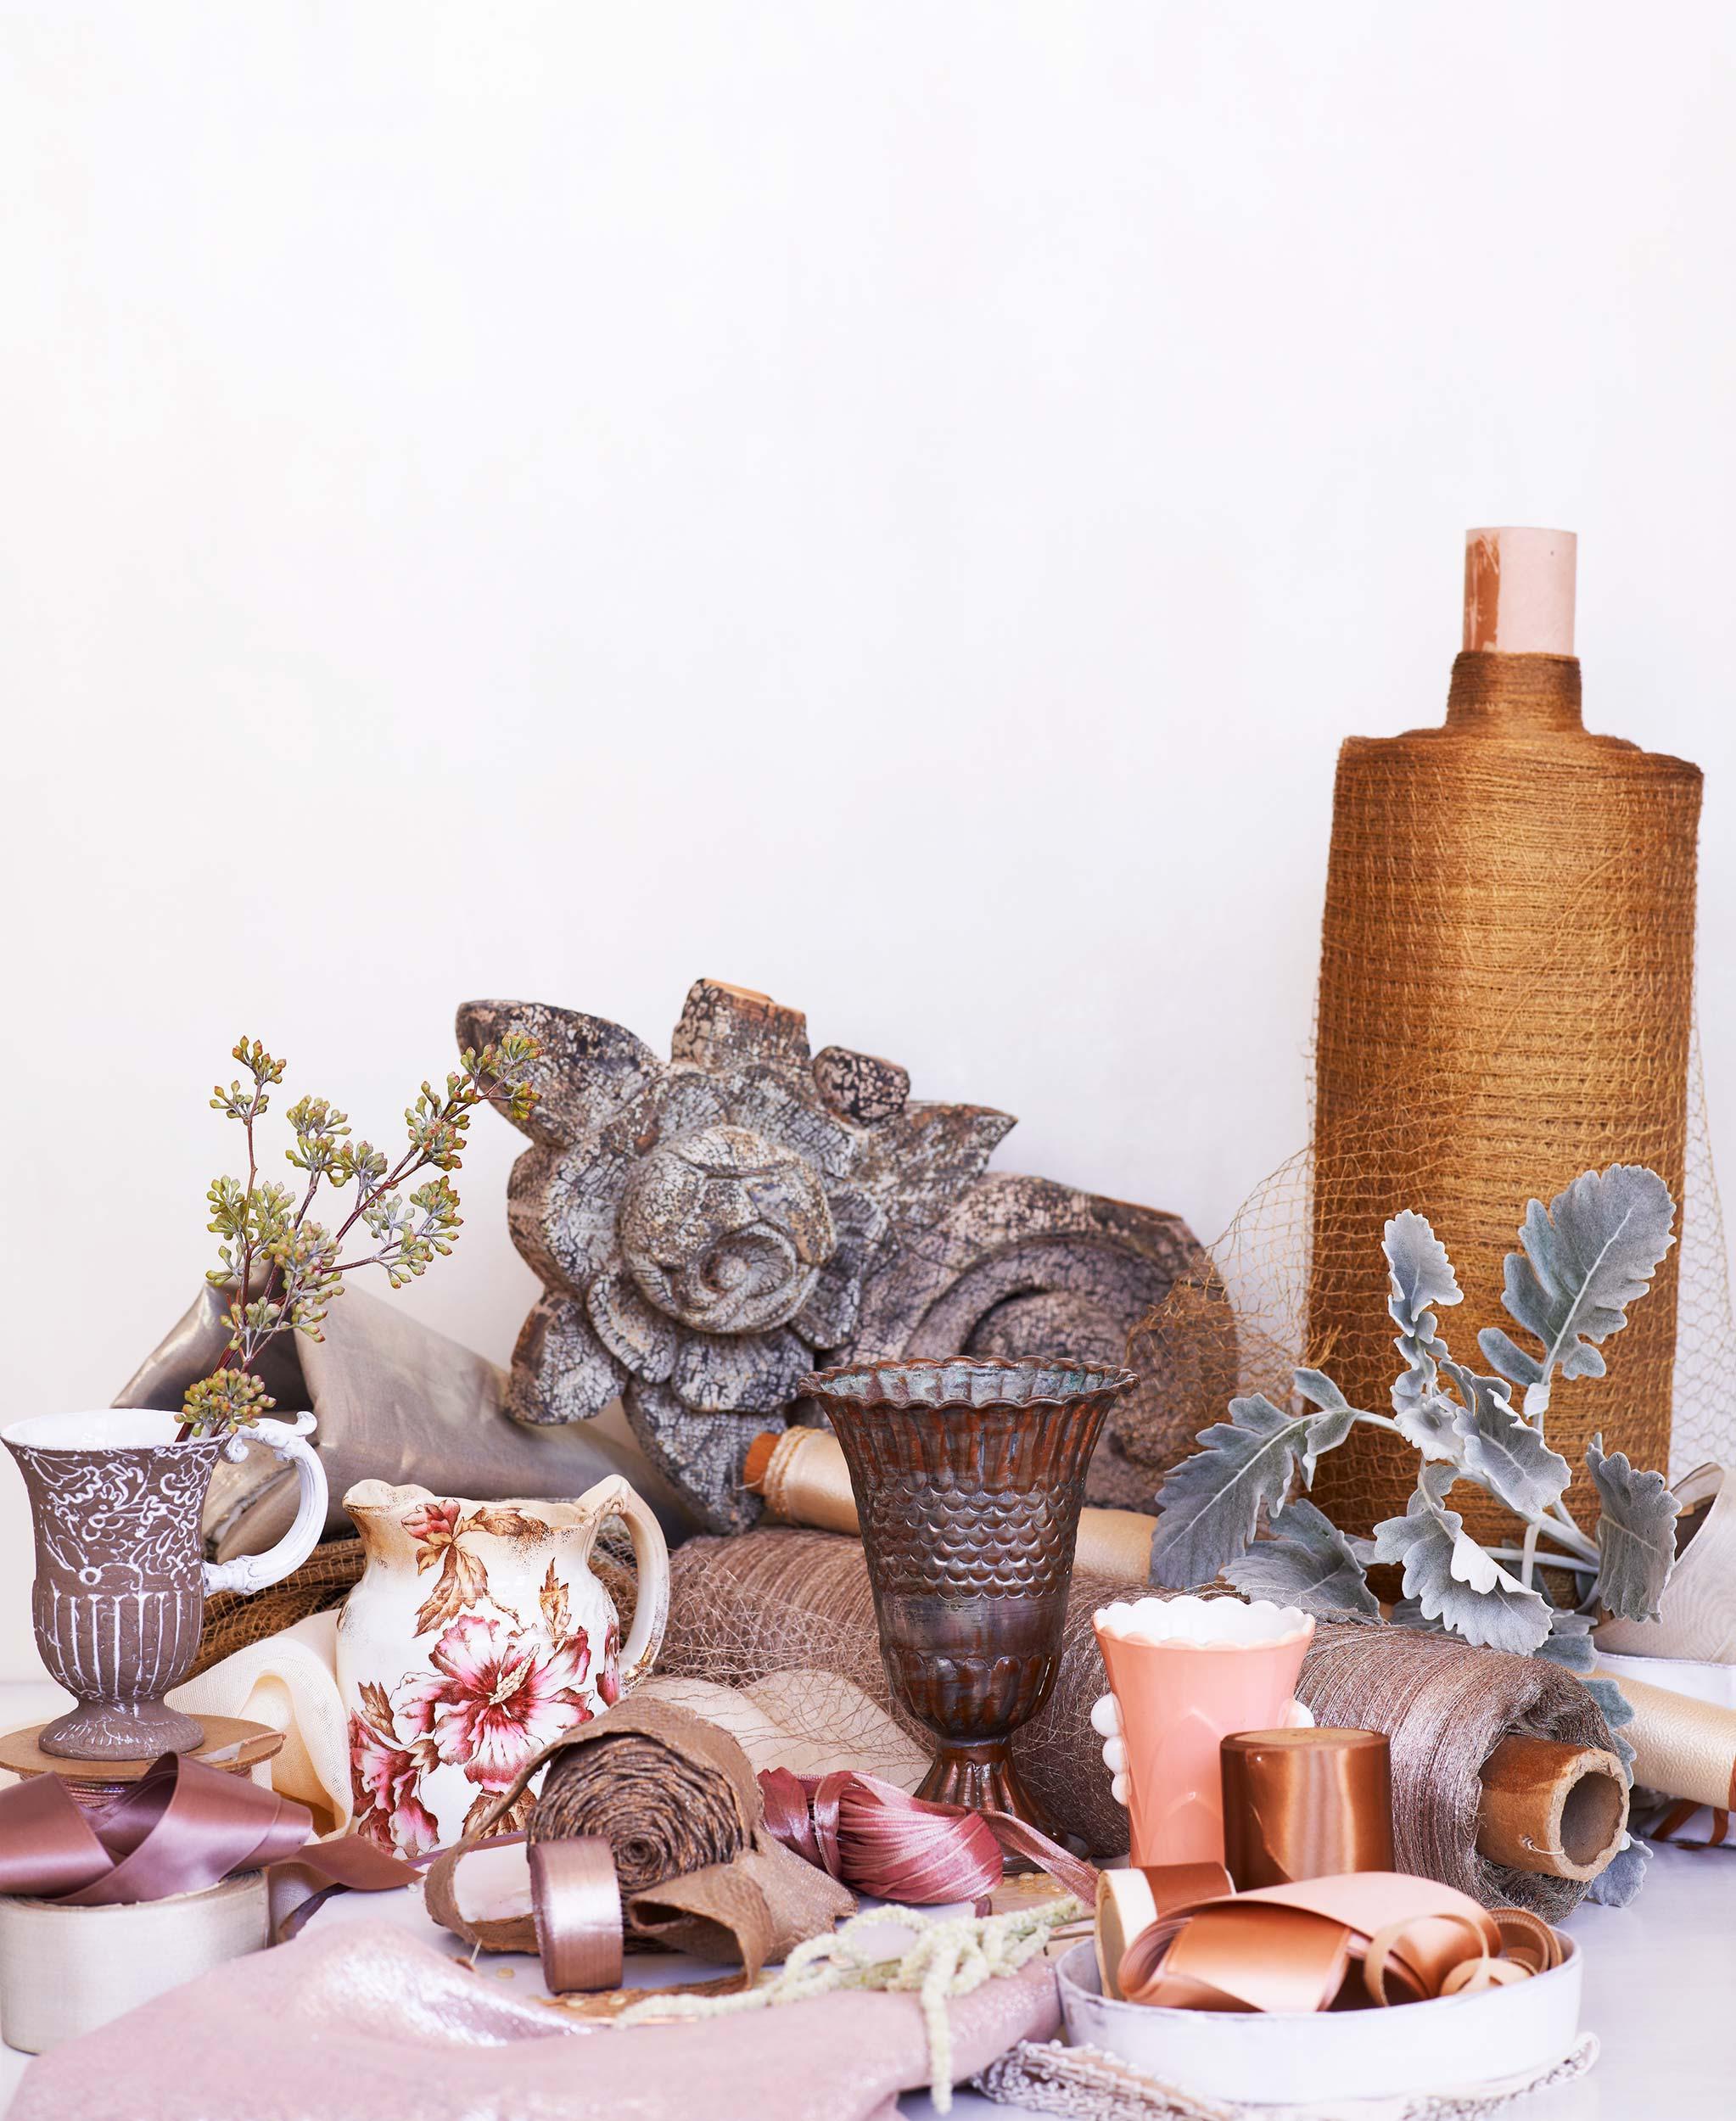 Inspirational-Objects-Seashell_0021.jpg